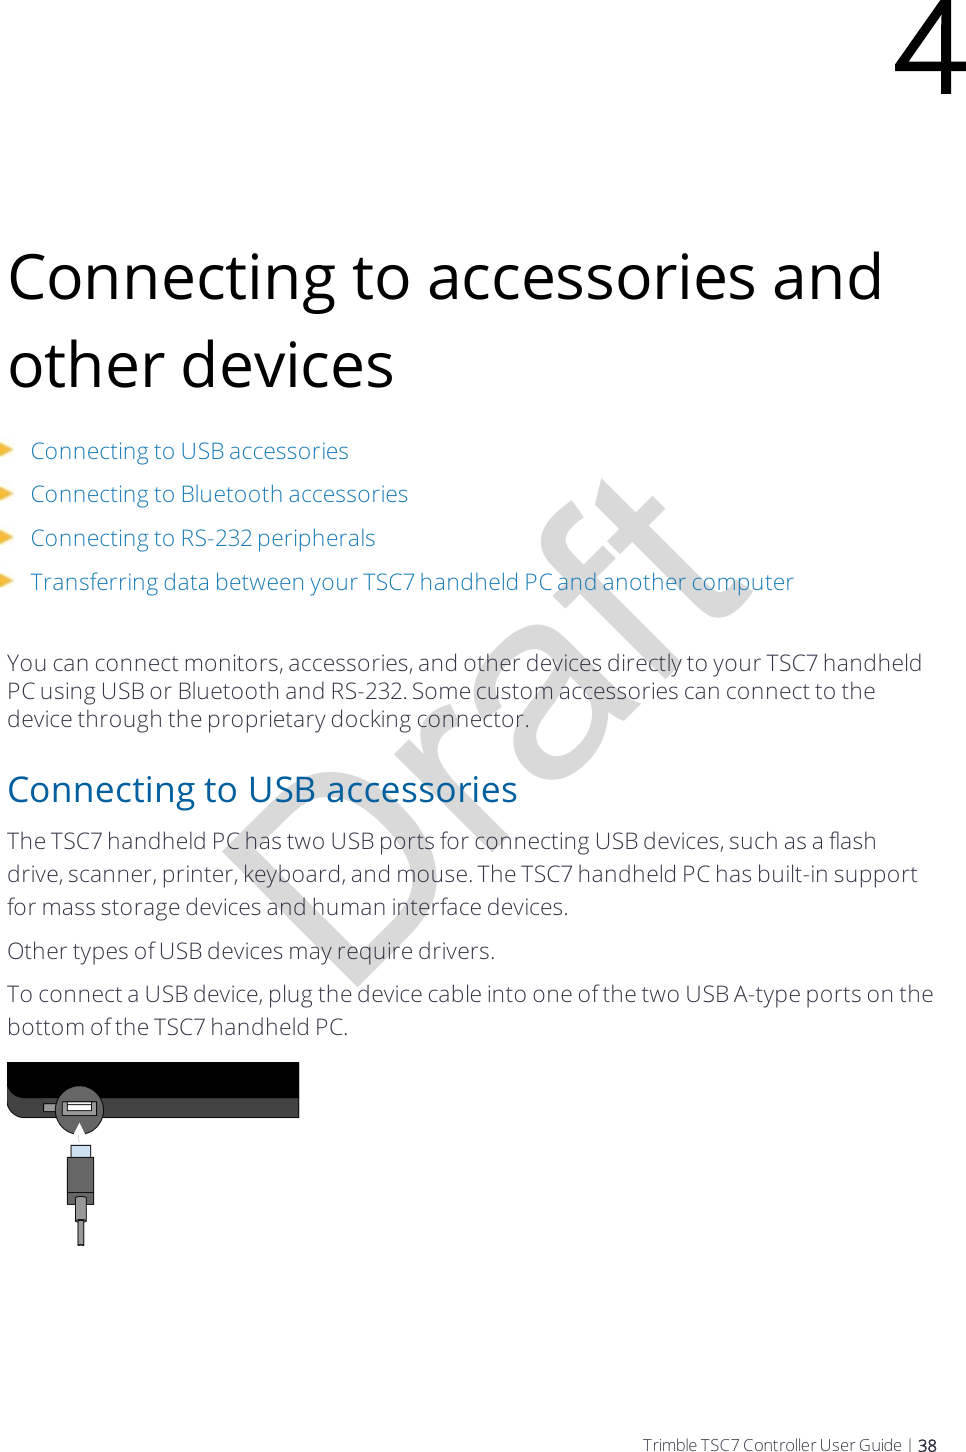 Trimble EM7455 Radio Module User Manual Trimble TSC7 Handheld PC